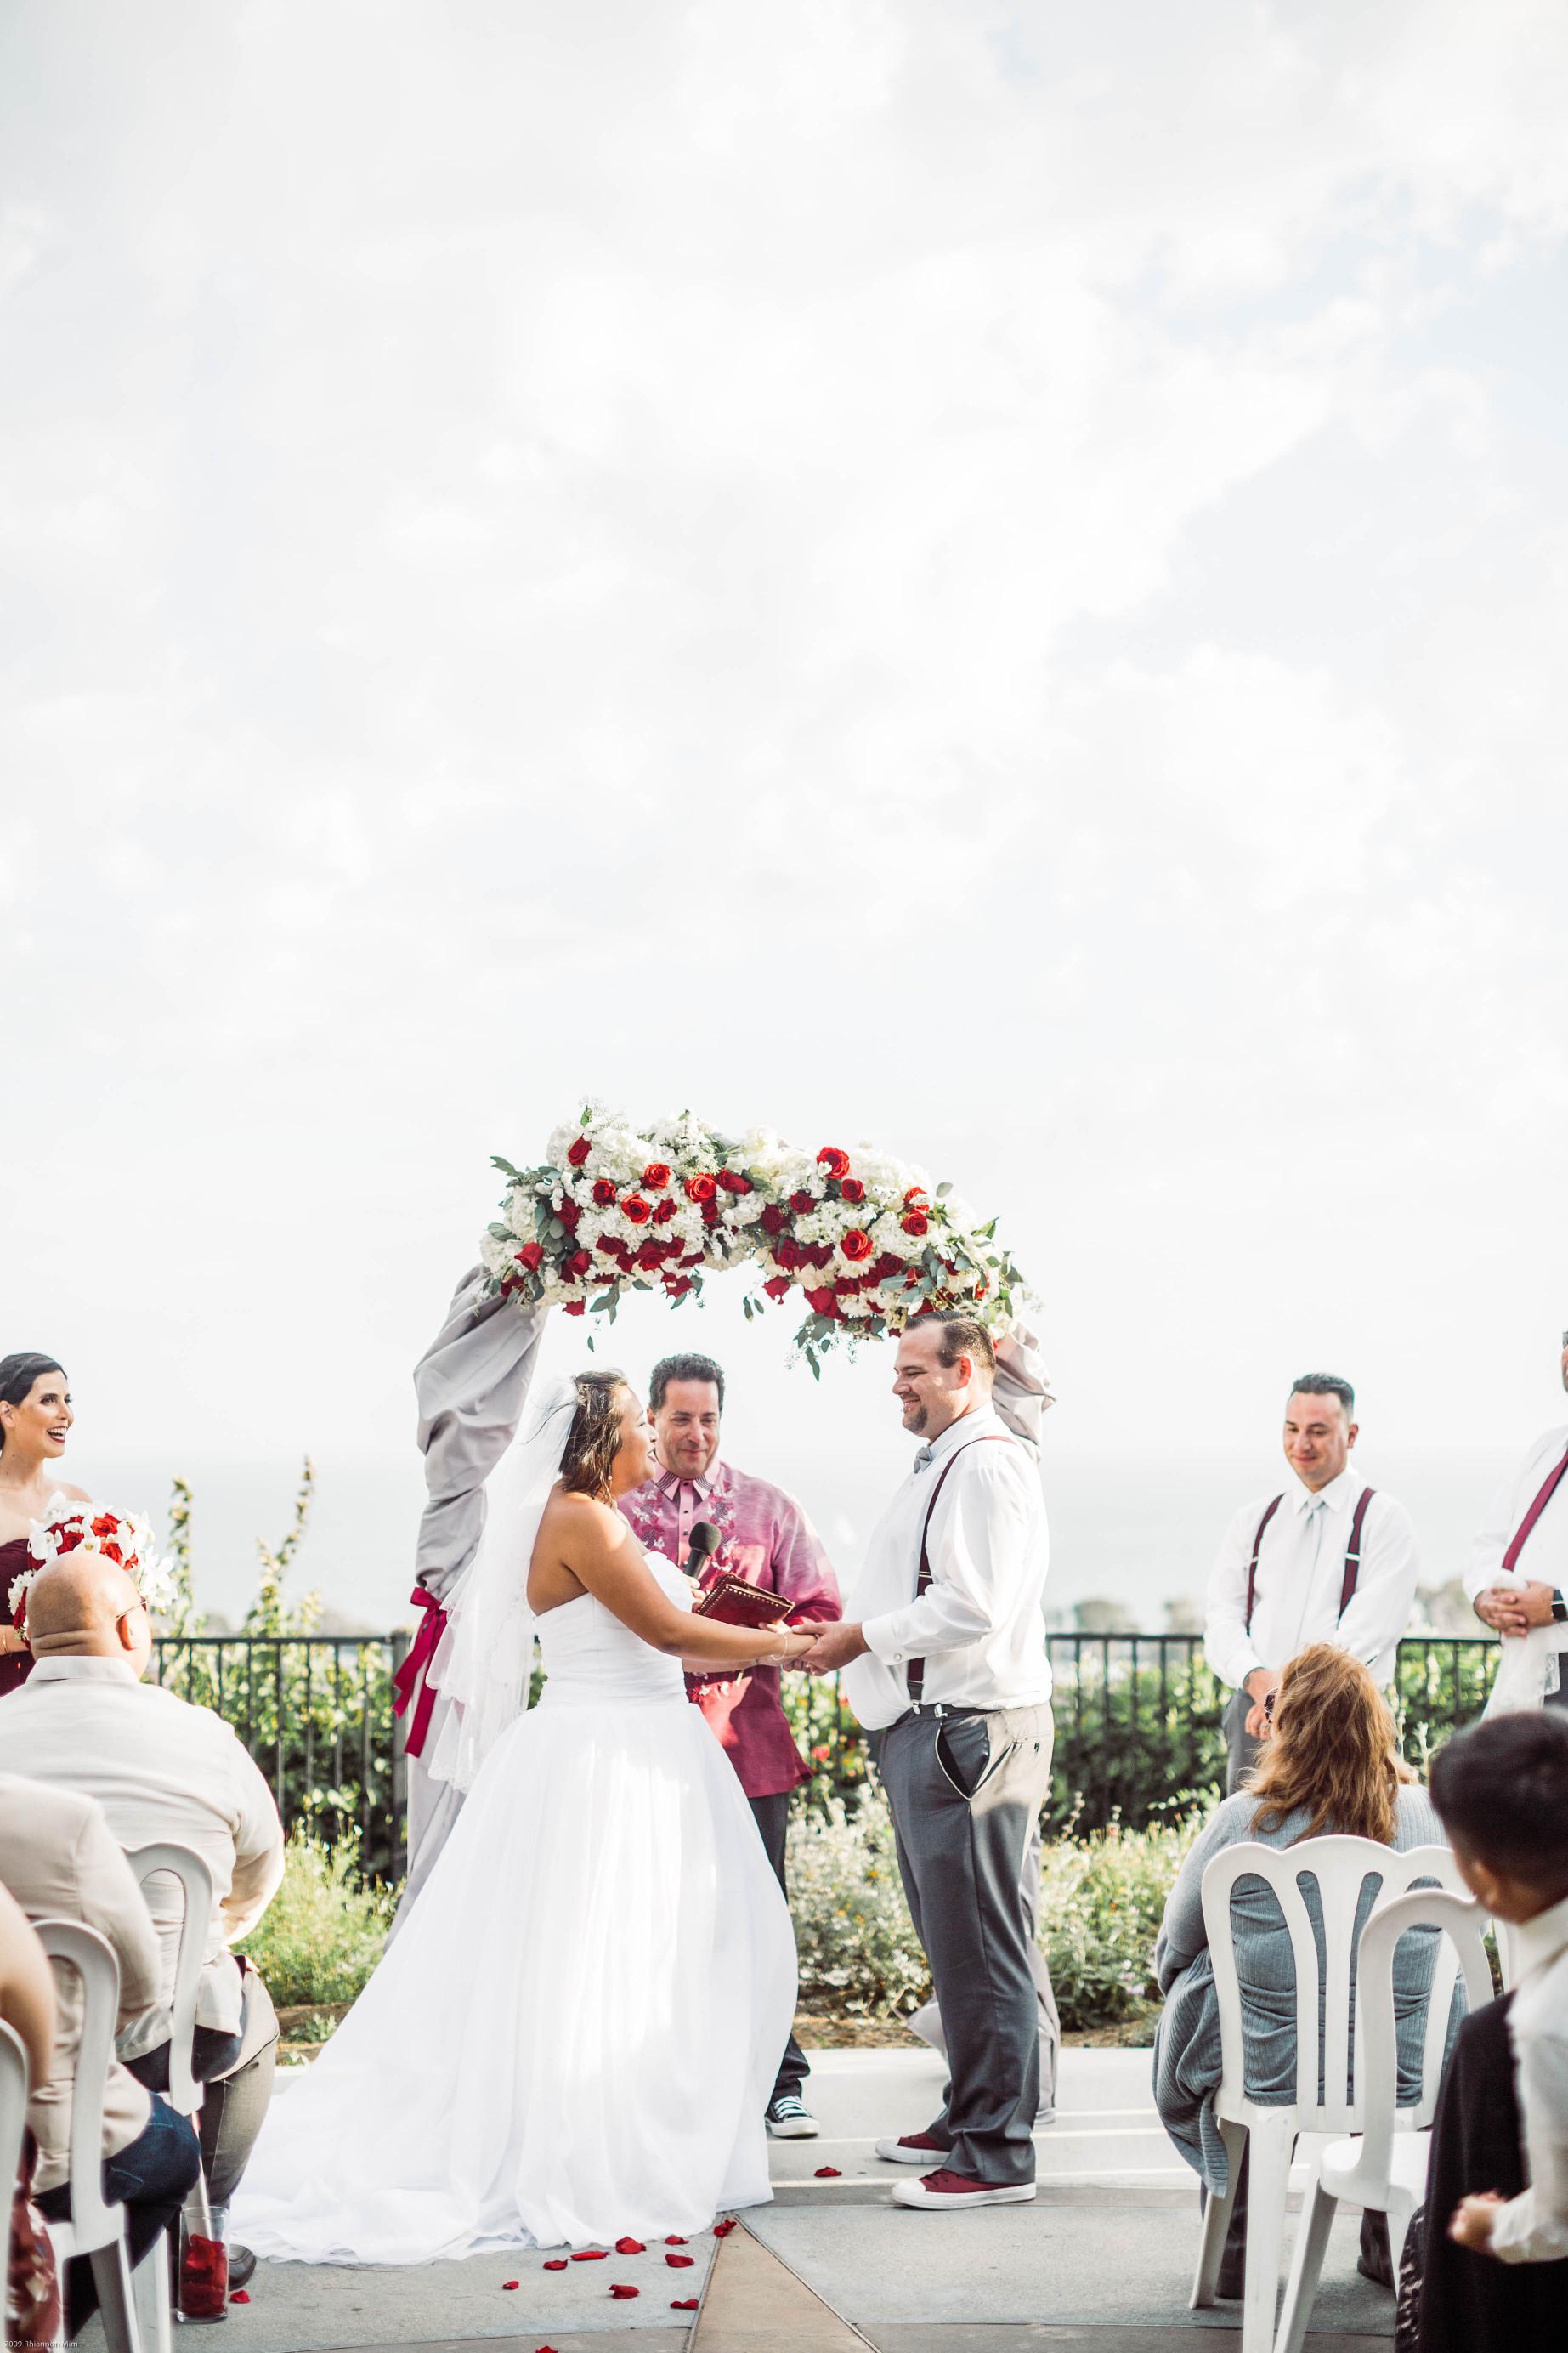 20170909_Wedding_0854